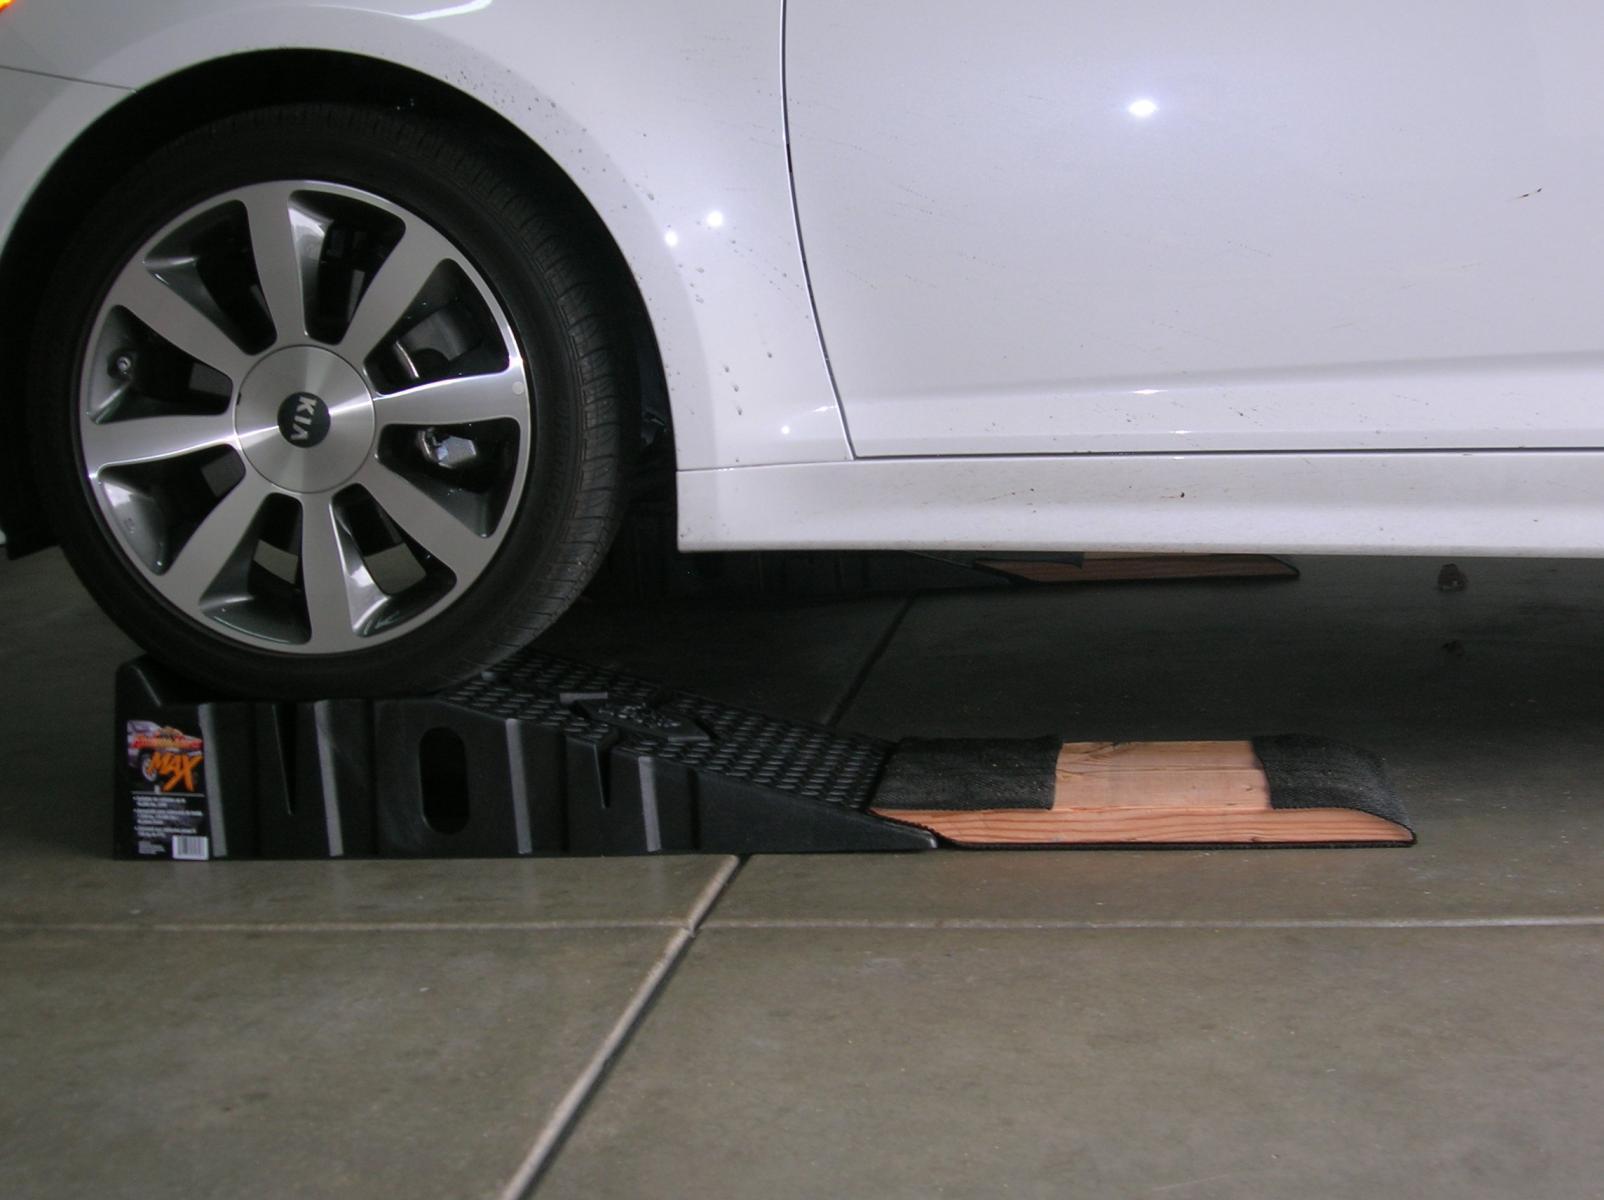 diy car ramps  eBay